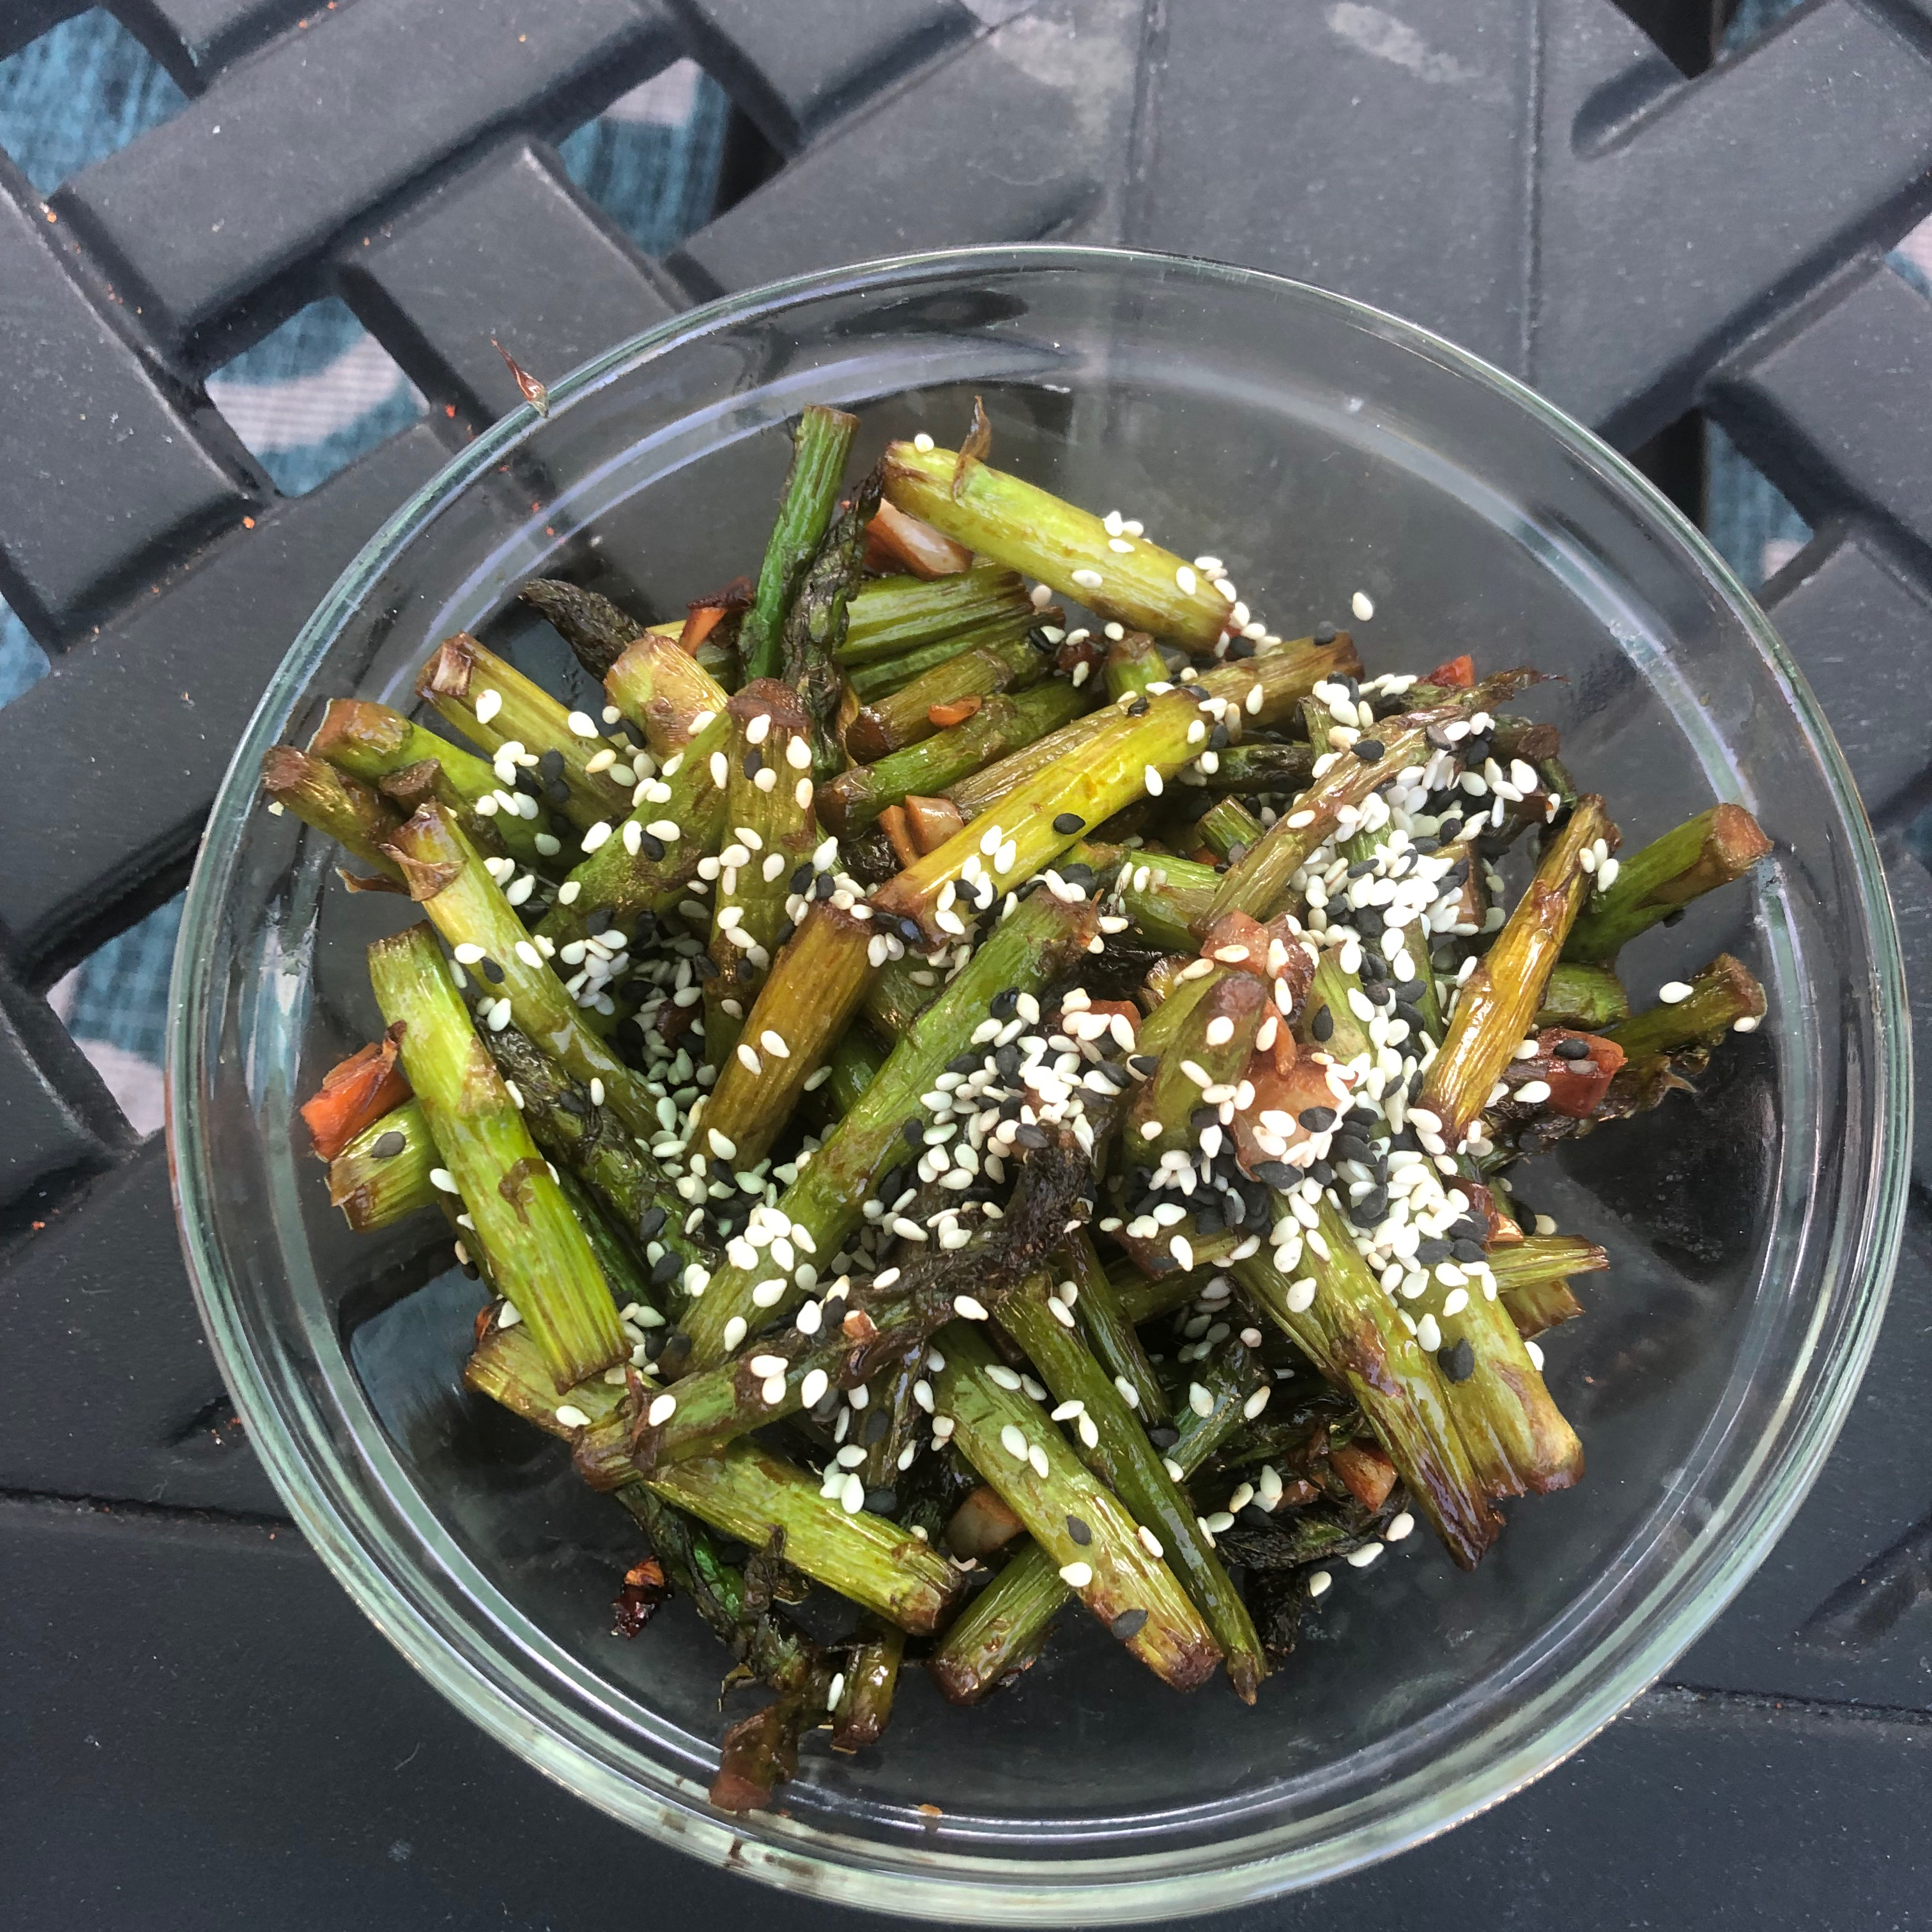 Garlic-Sauteed Asparagus The Simple Things